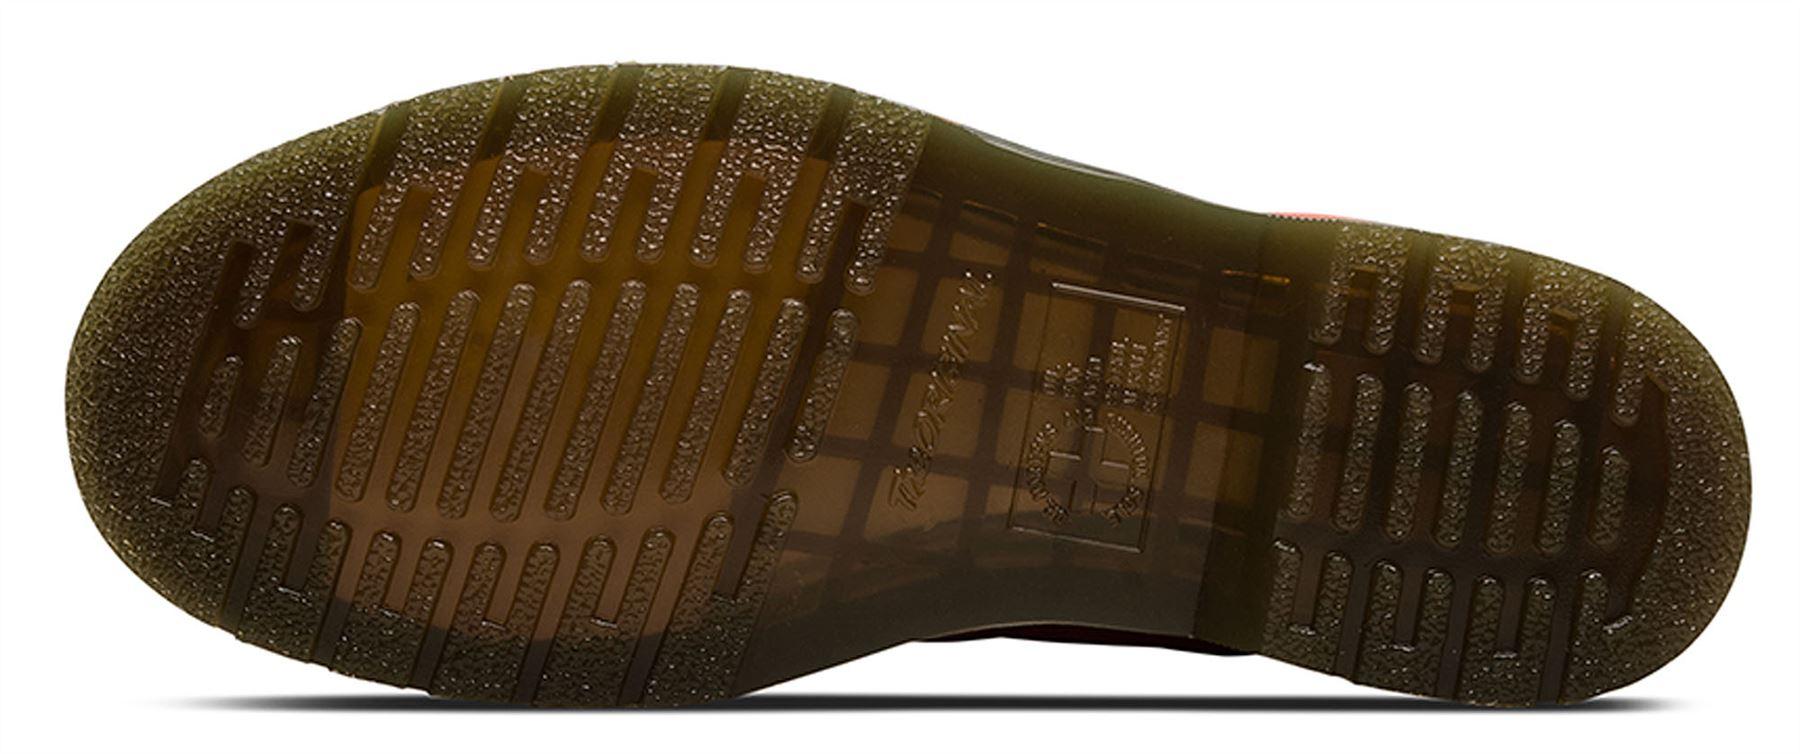 glattem Klassische 1460 Unisex 24614636 Satchel klassische Dr aus Augen Leder Stiefeletten 8 Martens Eqvw11I